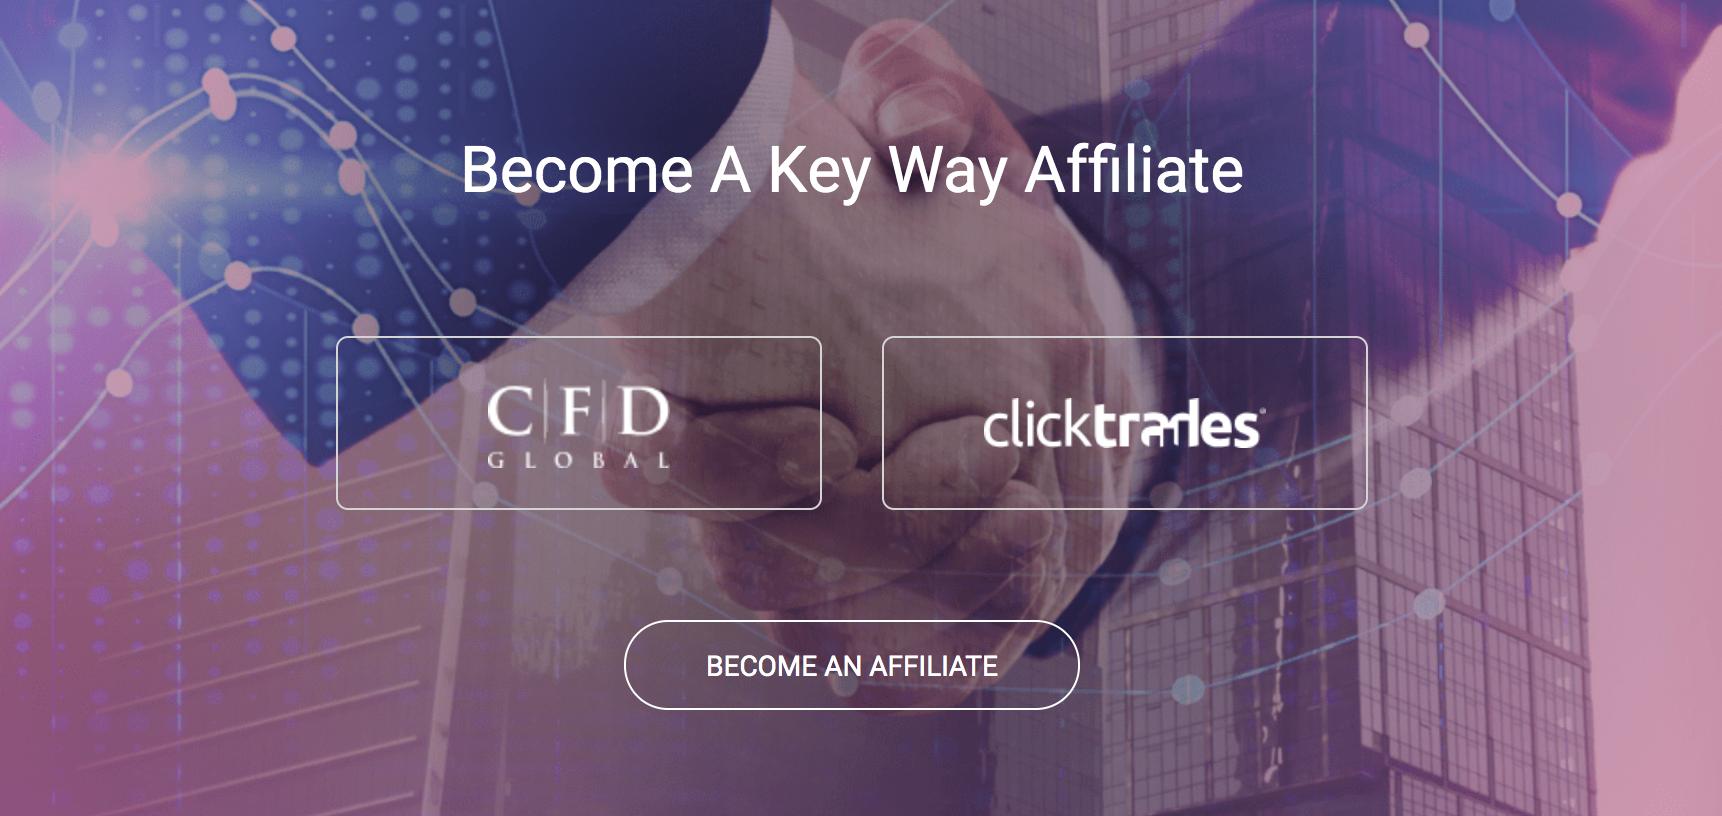 Key Way Affiliates Banner